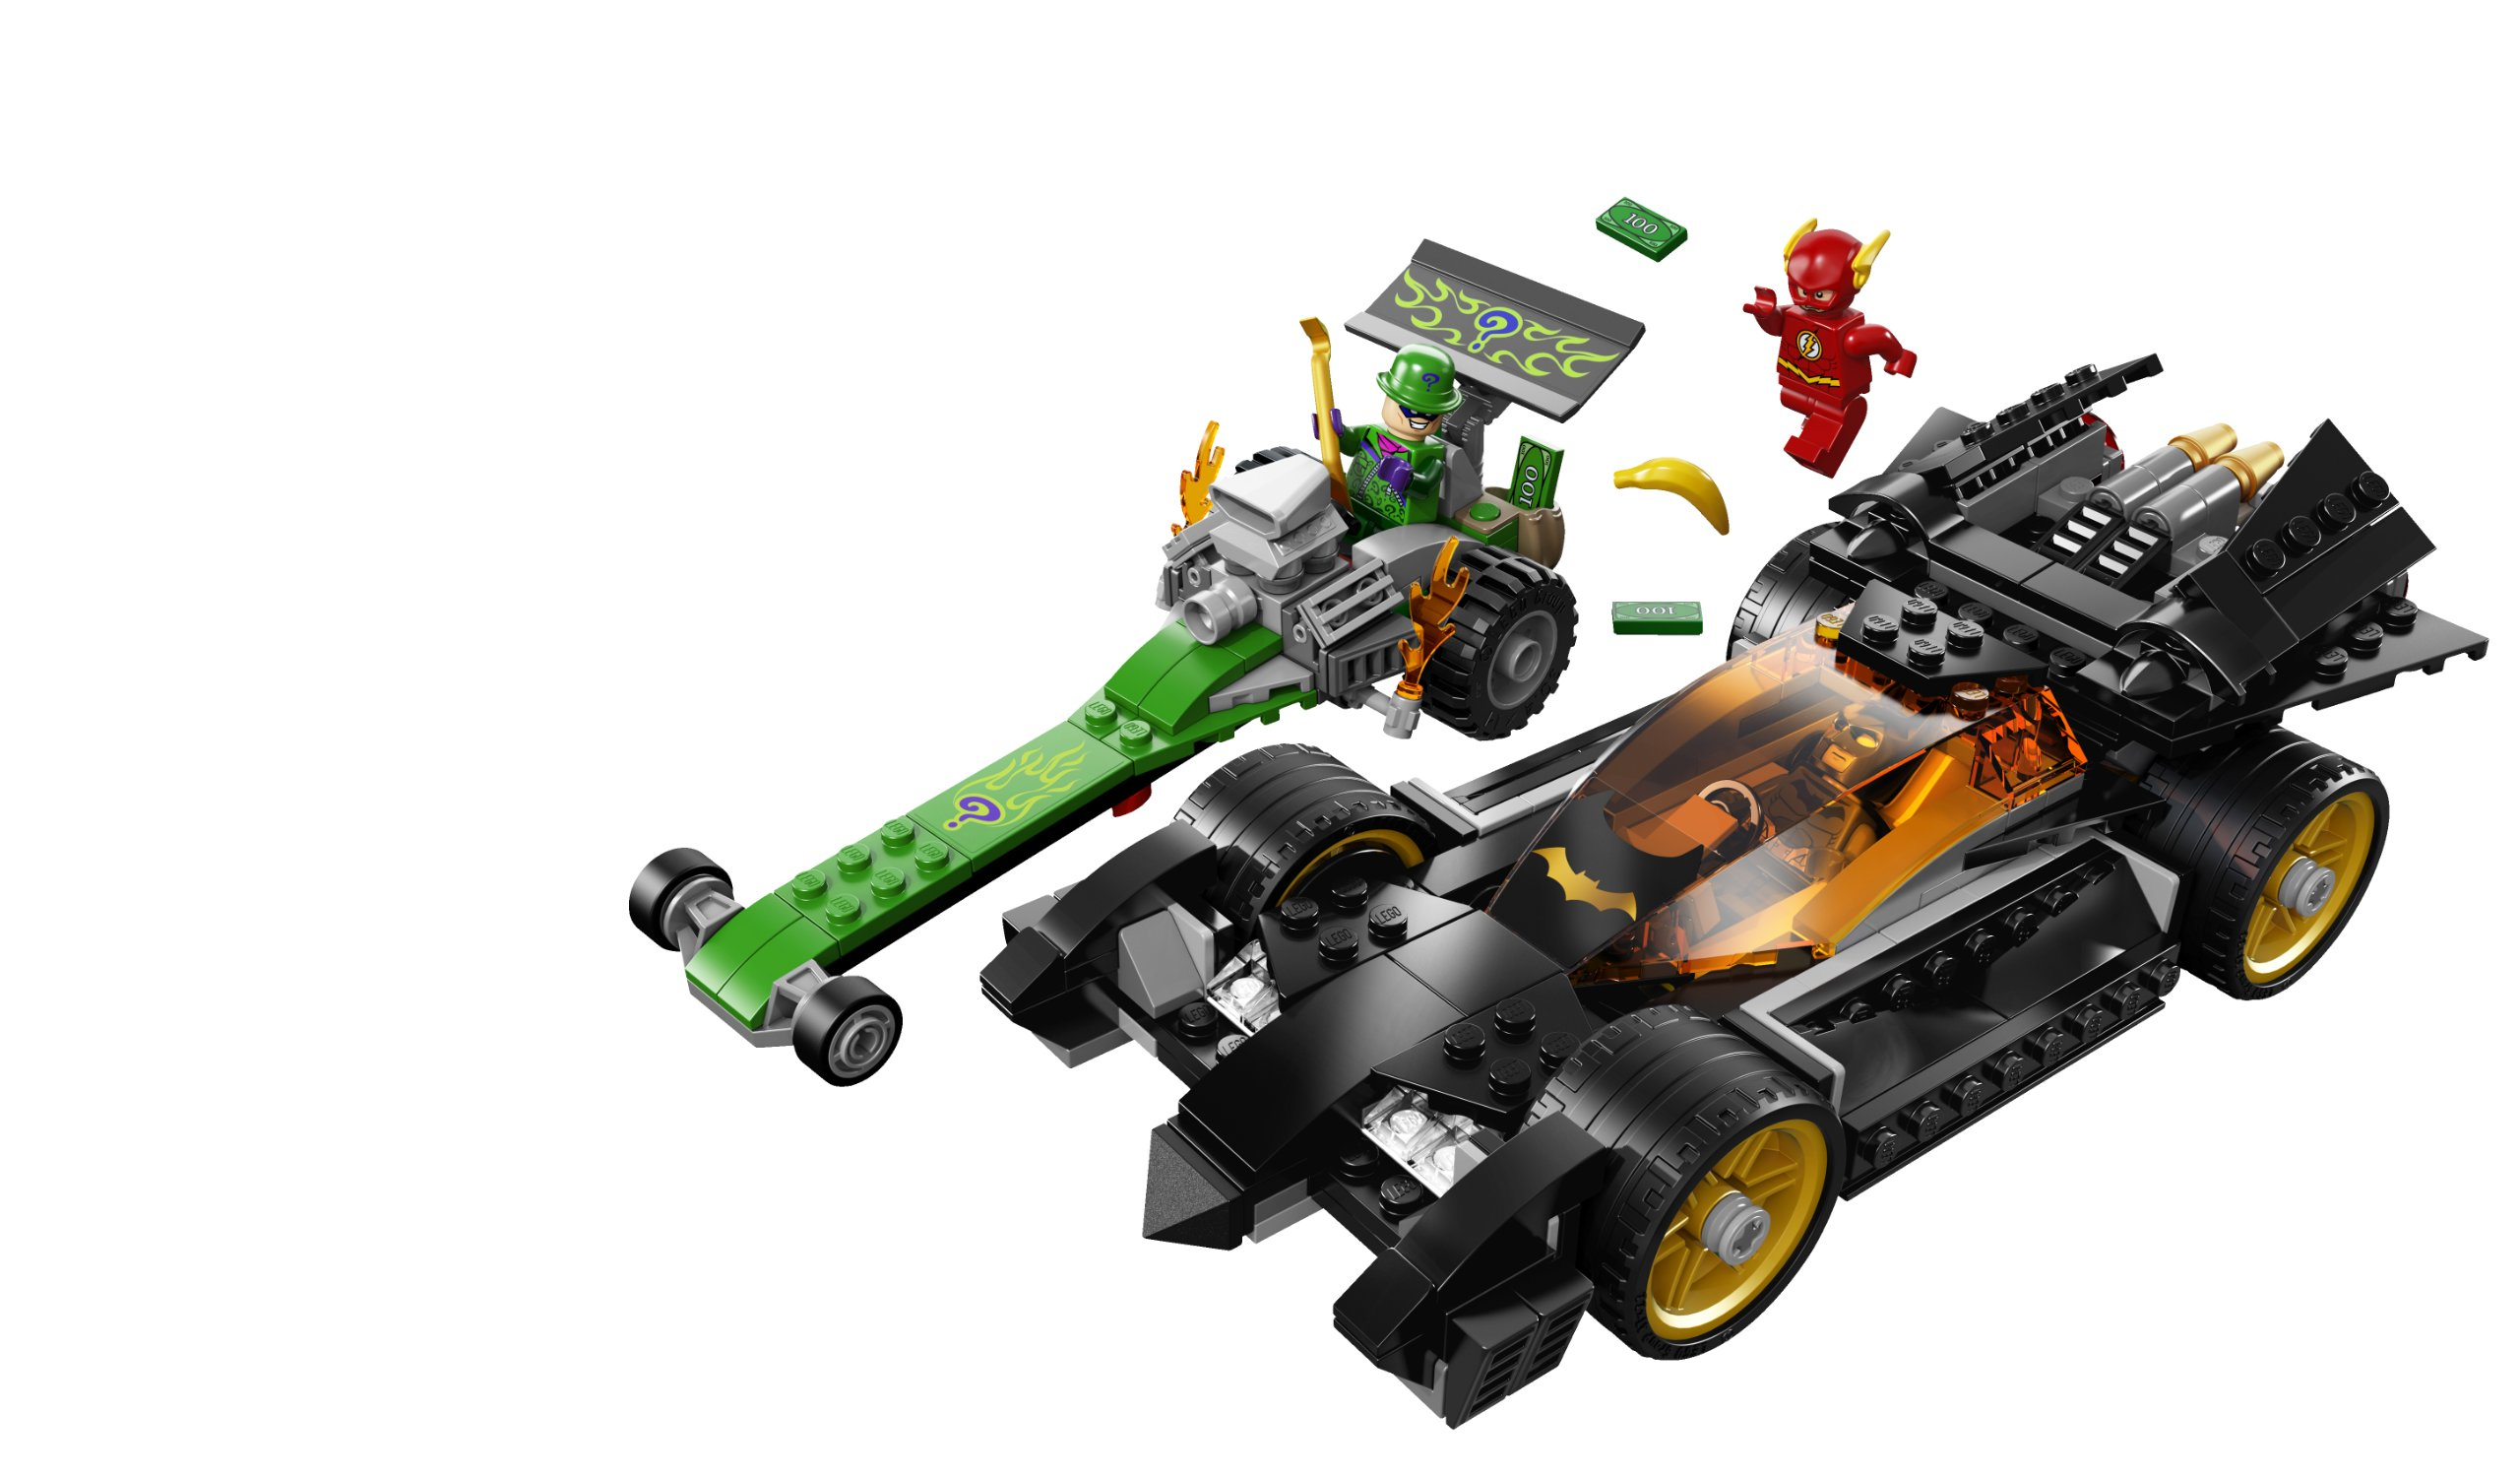 Lego  76012 Super Heroes DC The Batmobile Batman Minifigure Manual 2 Lot ONLY